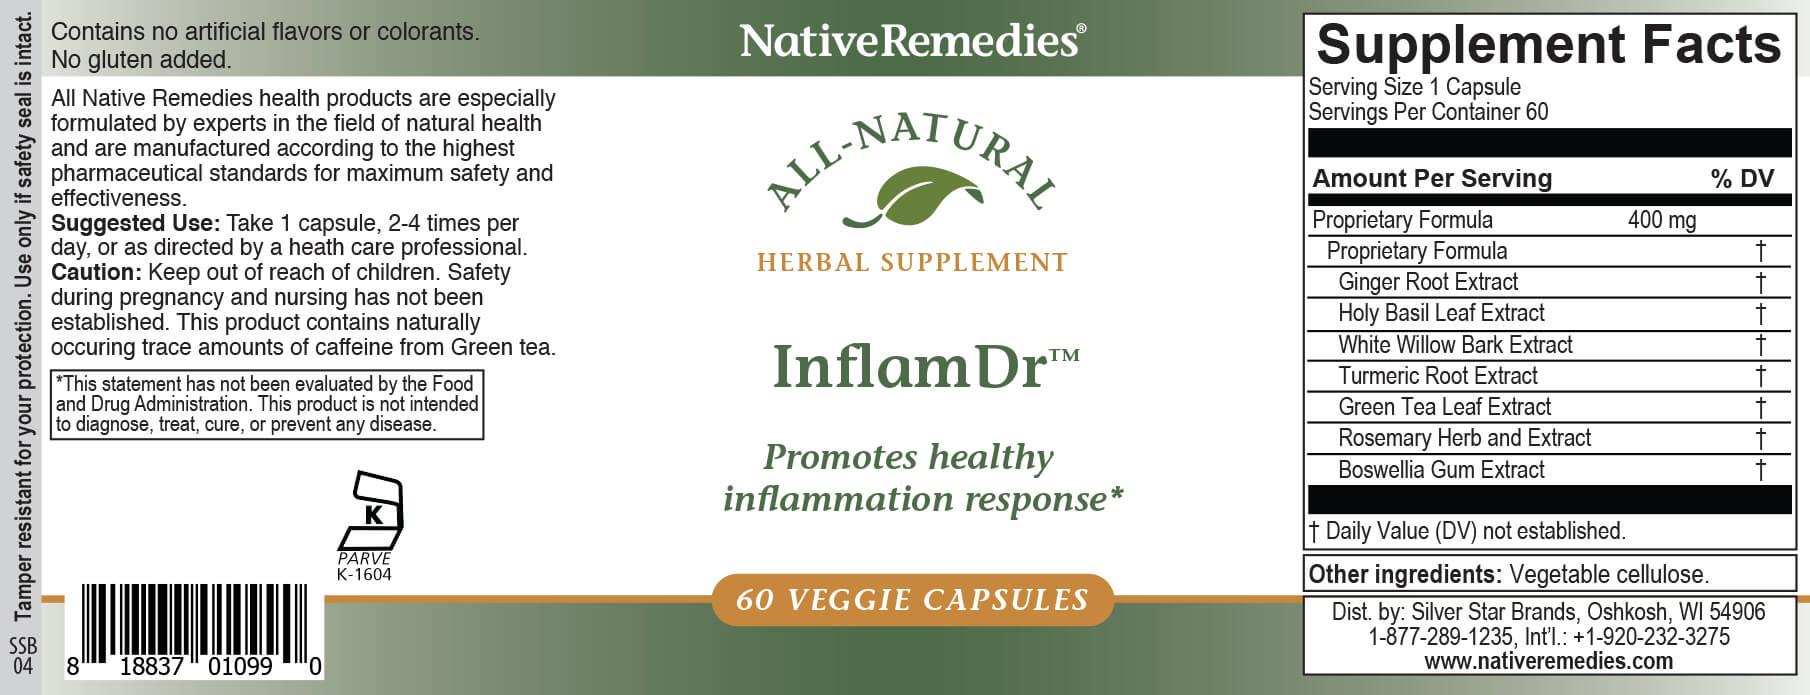 NativeRemedies® Inflam Dr.™-352106